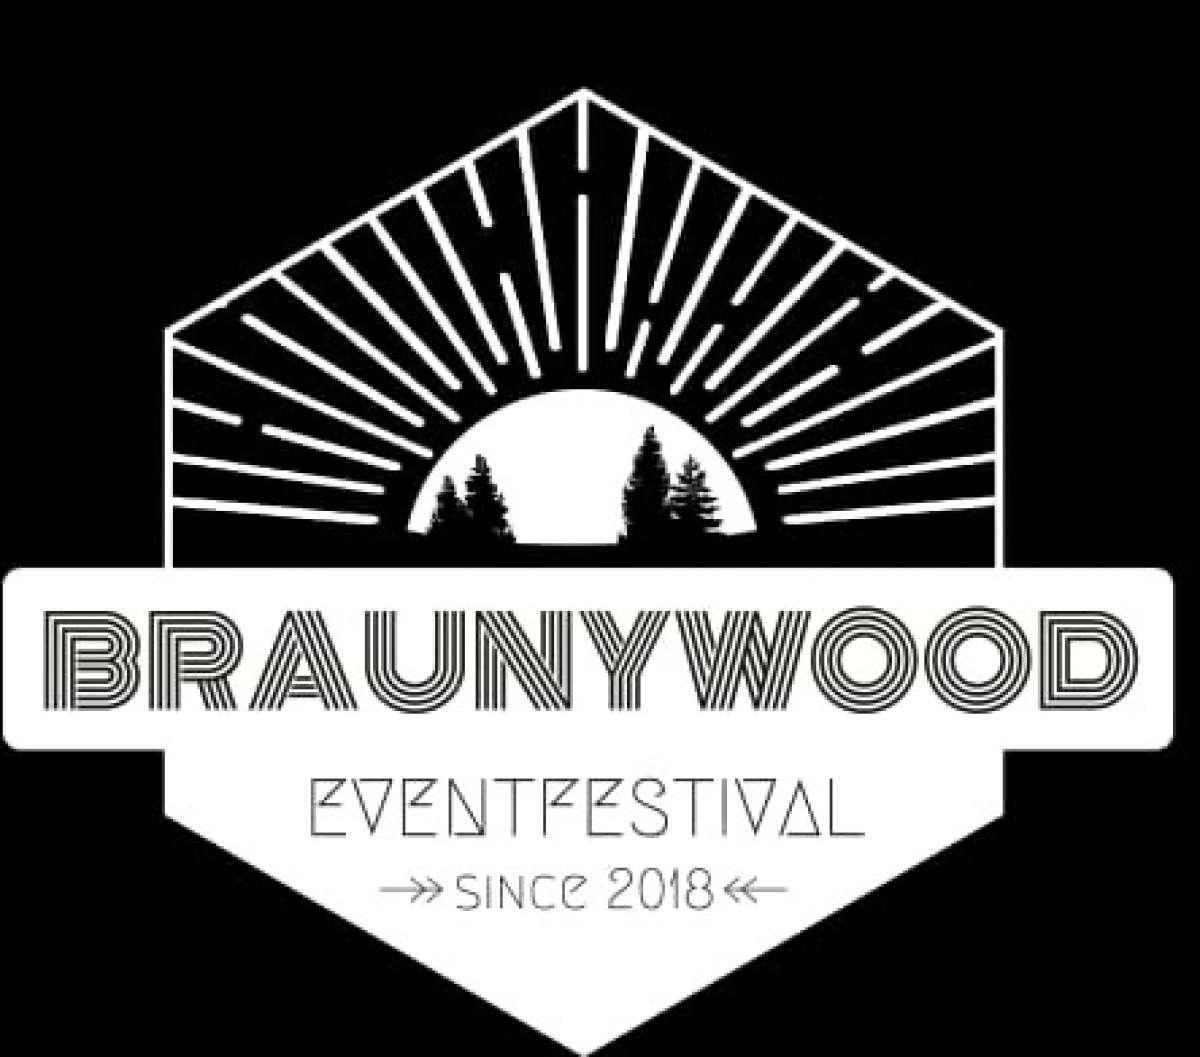 Braunywood Eventfestival